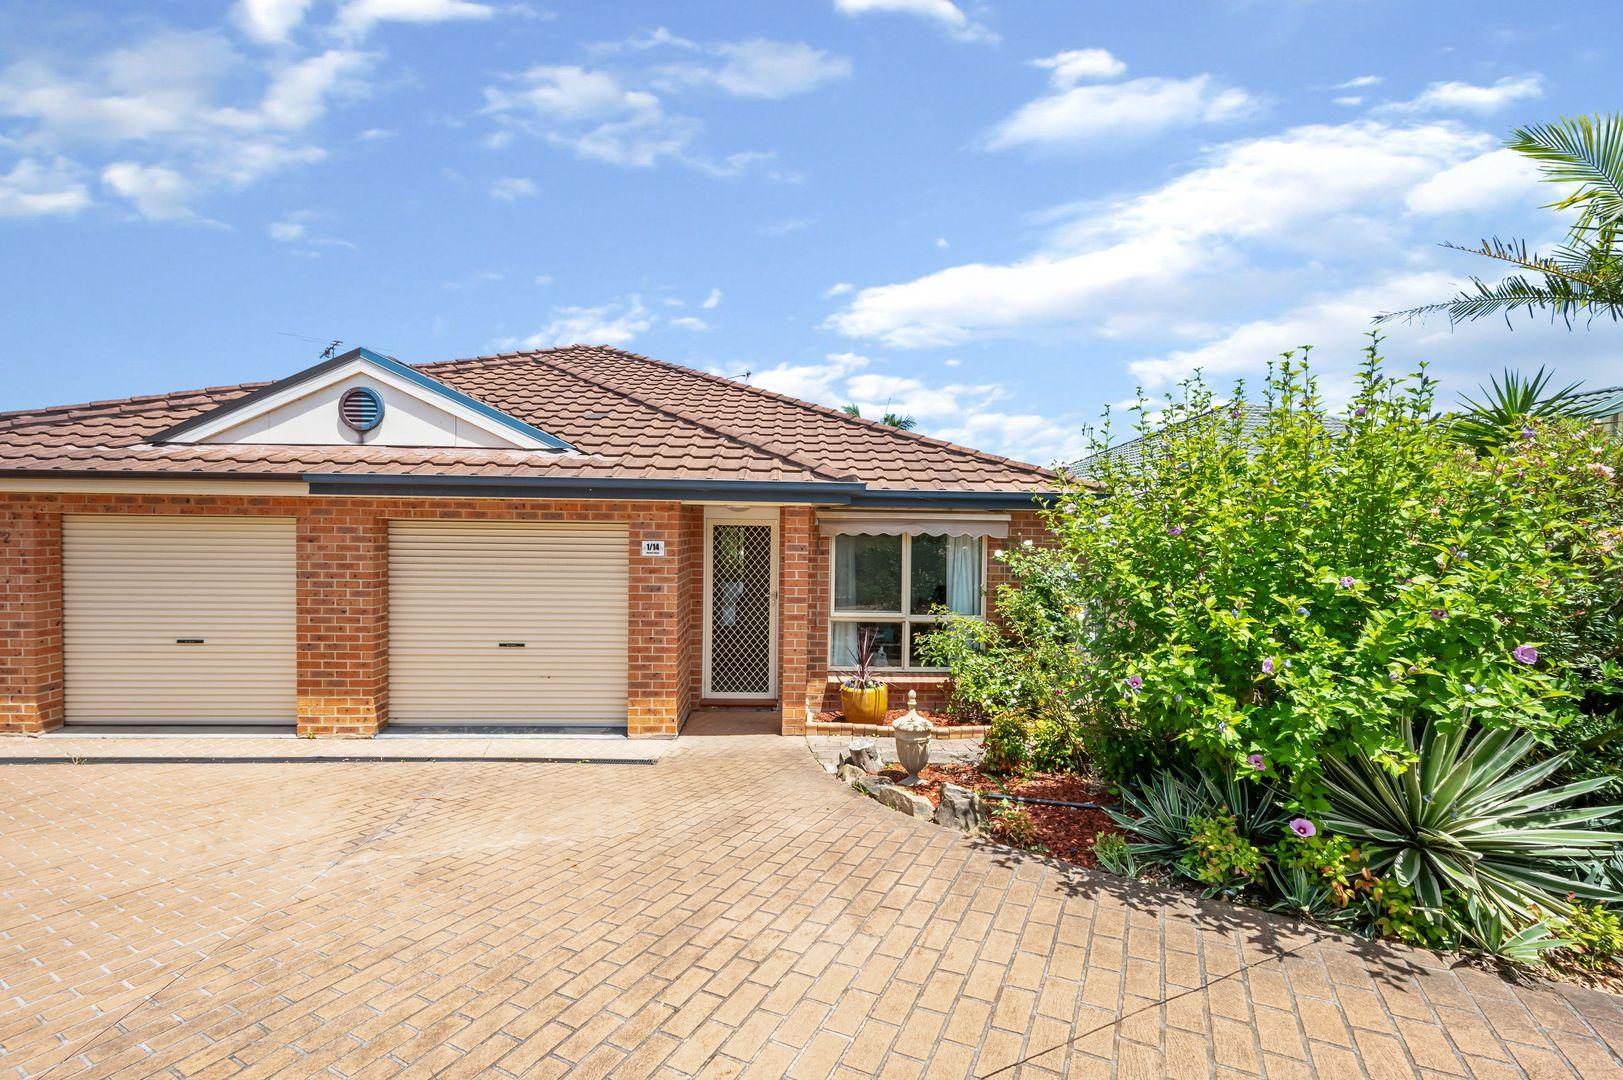 1/14 Harriet Close, Raymond Terrace NSW 2324, Image 0